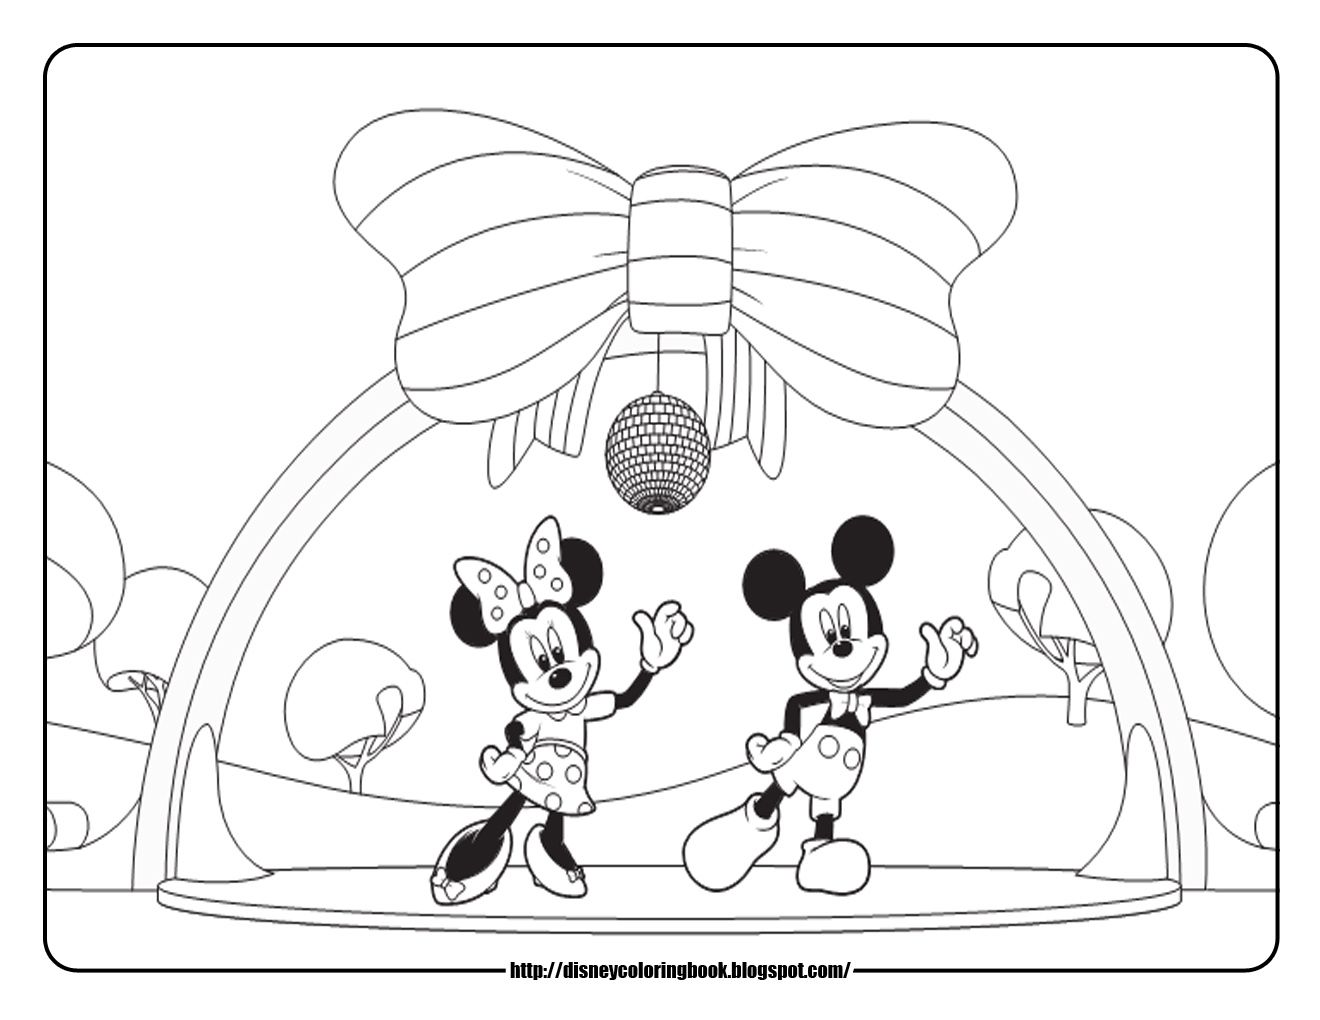 disney coloring pages  Koltons 1st Bday  Pinterest  Disney